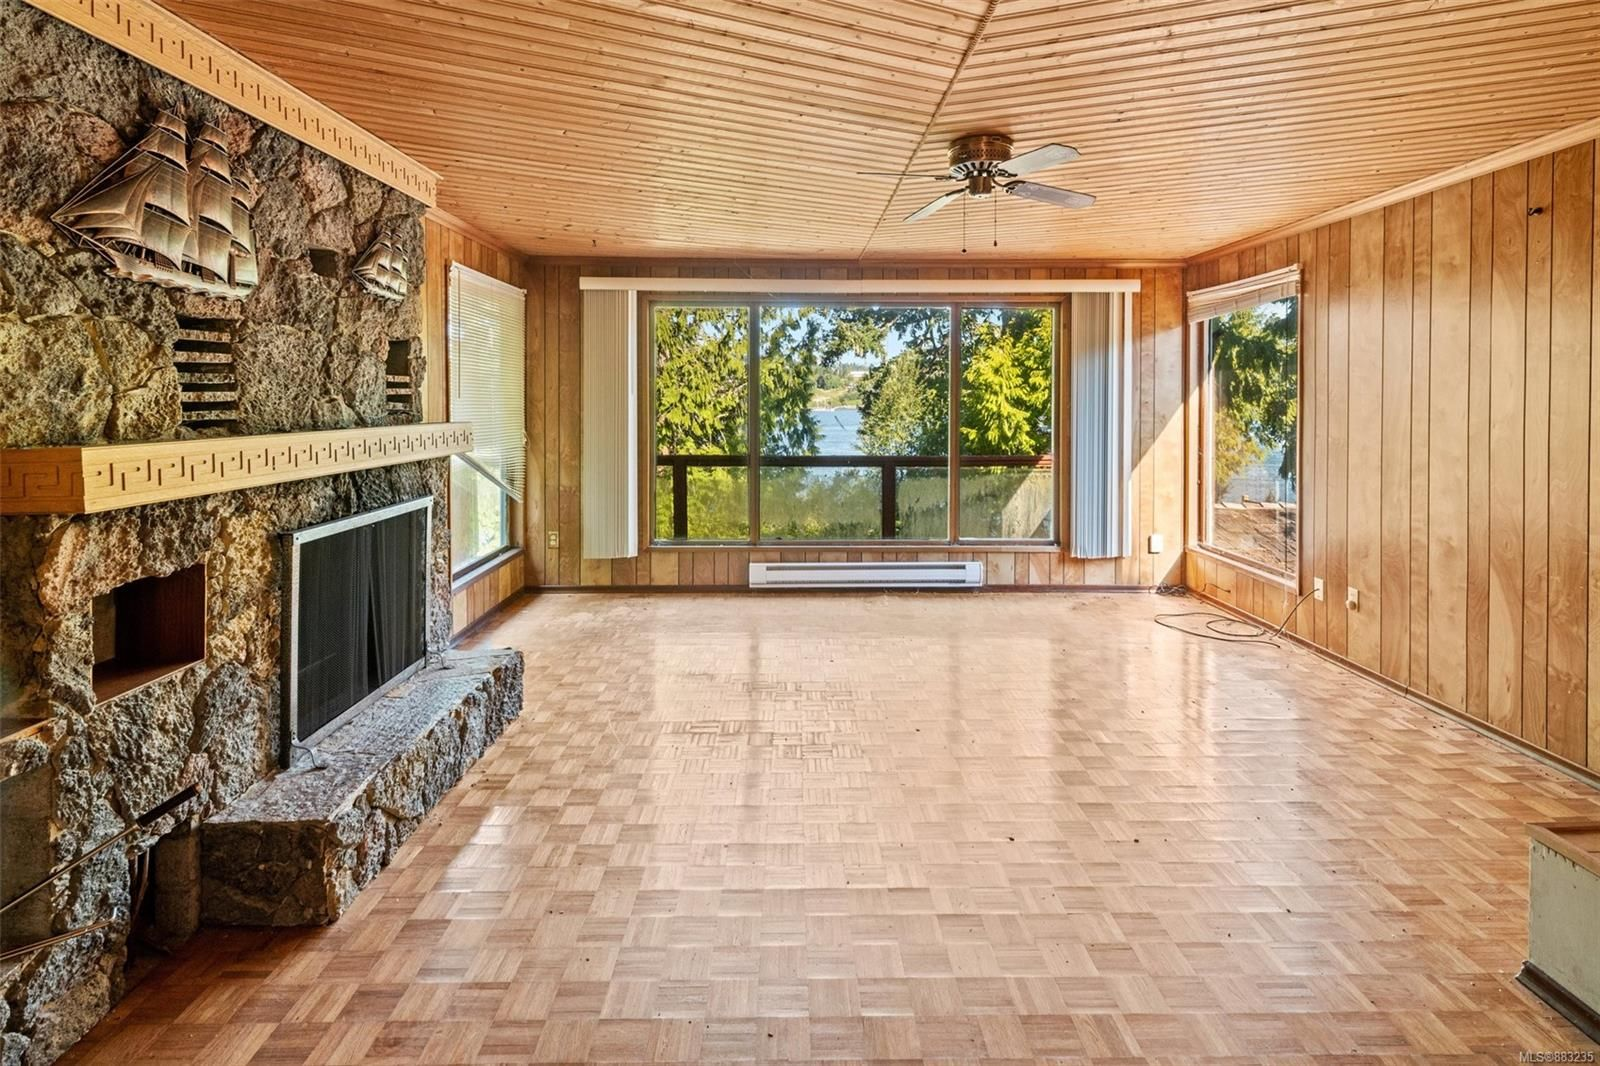 Photo 20: Photos: 6542 Thornett Rd in : Sk East Sooke House for sale (Sooke)  : MLS®# 883235